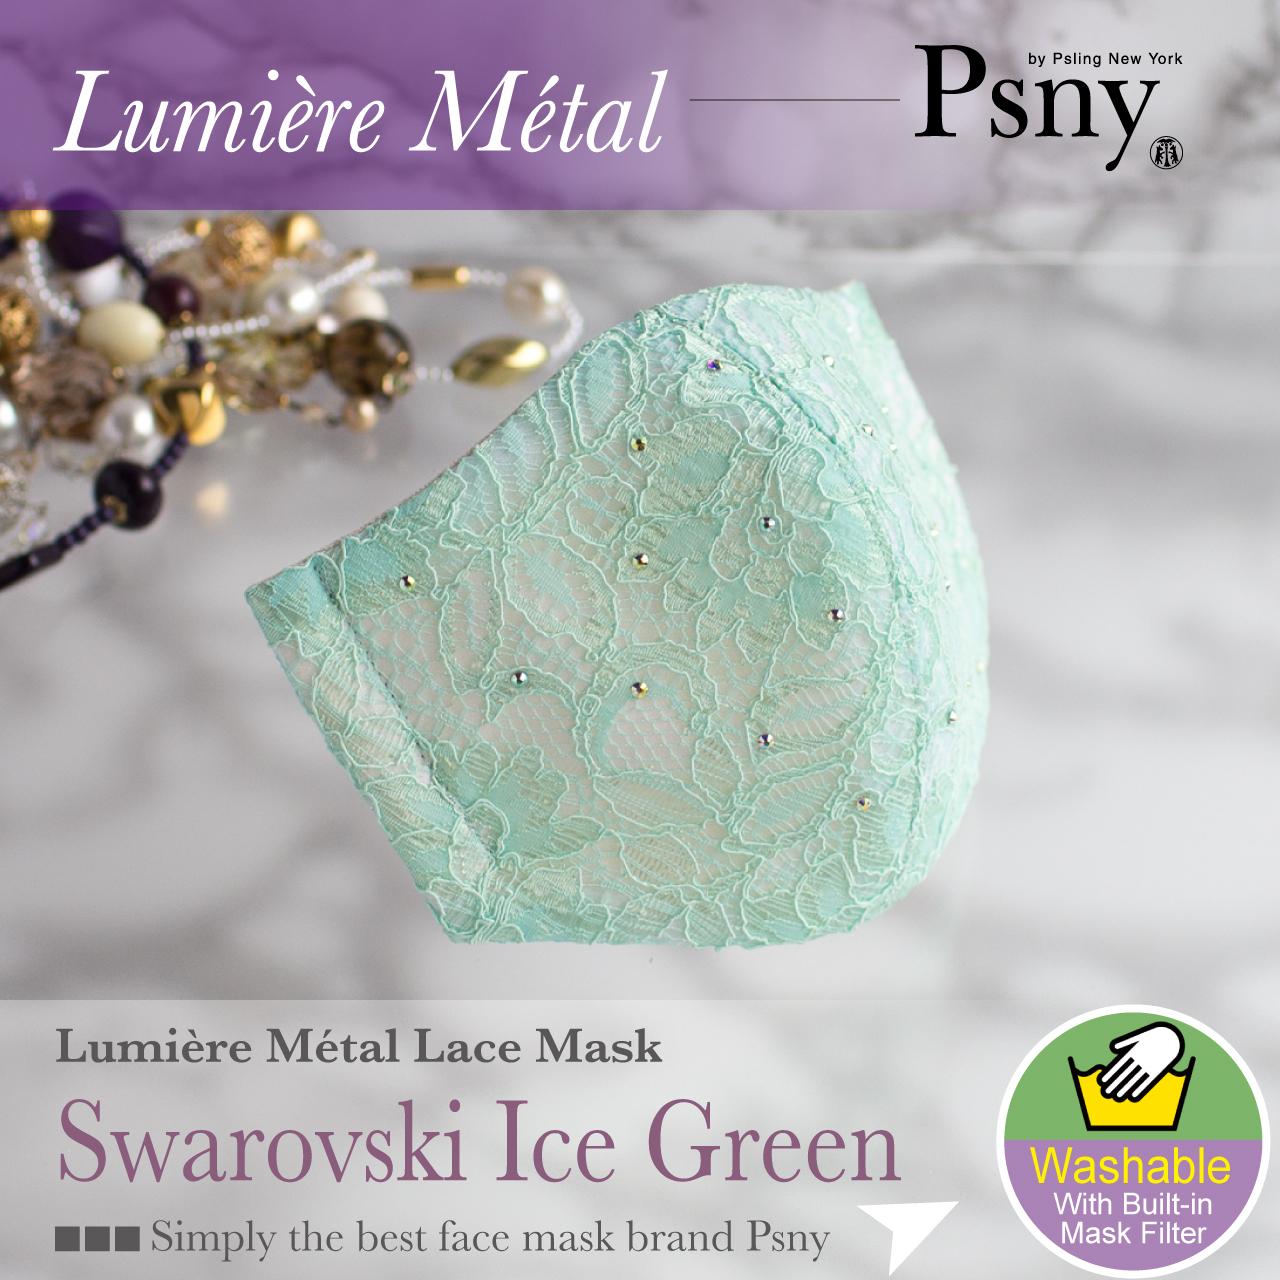 PSNY スワロフスキー レース・アイスグリーン 花粉 黄砂 不織布フィルター 立体 大人 美しい マスク 送料無料 LM5s